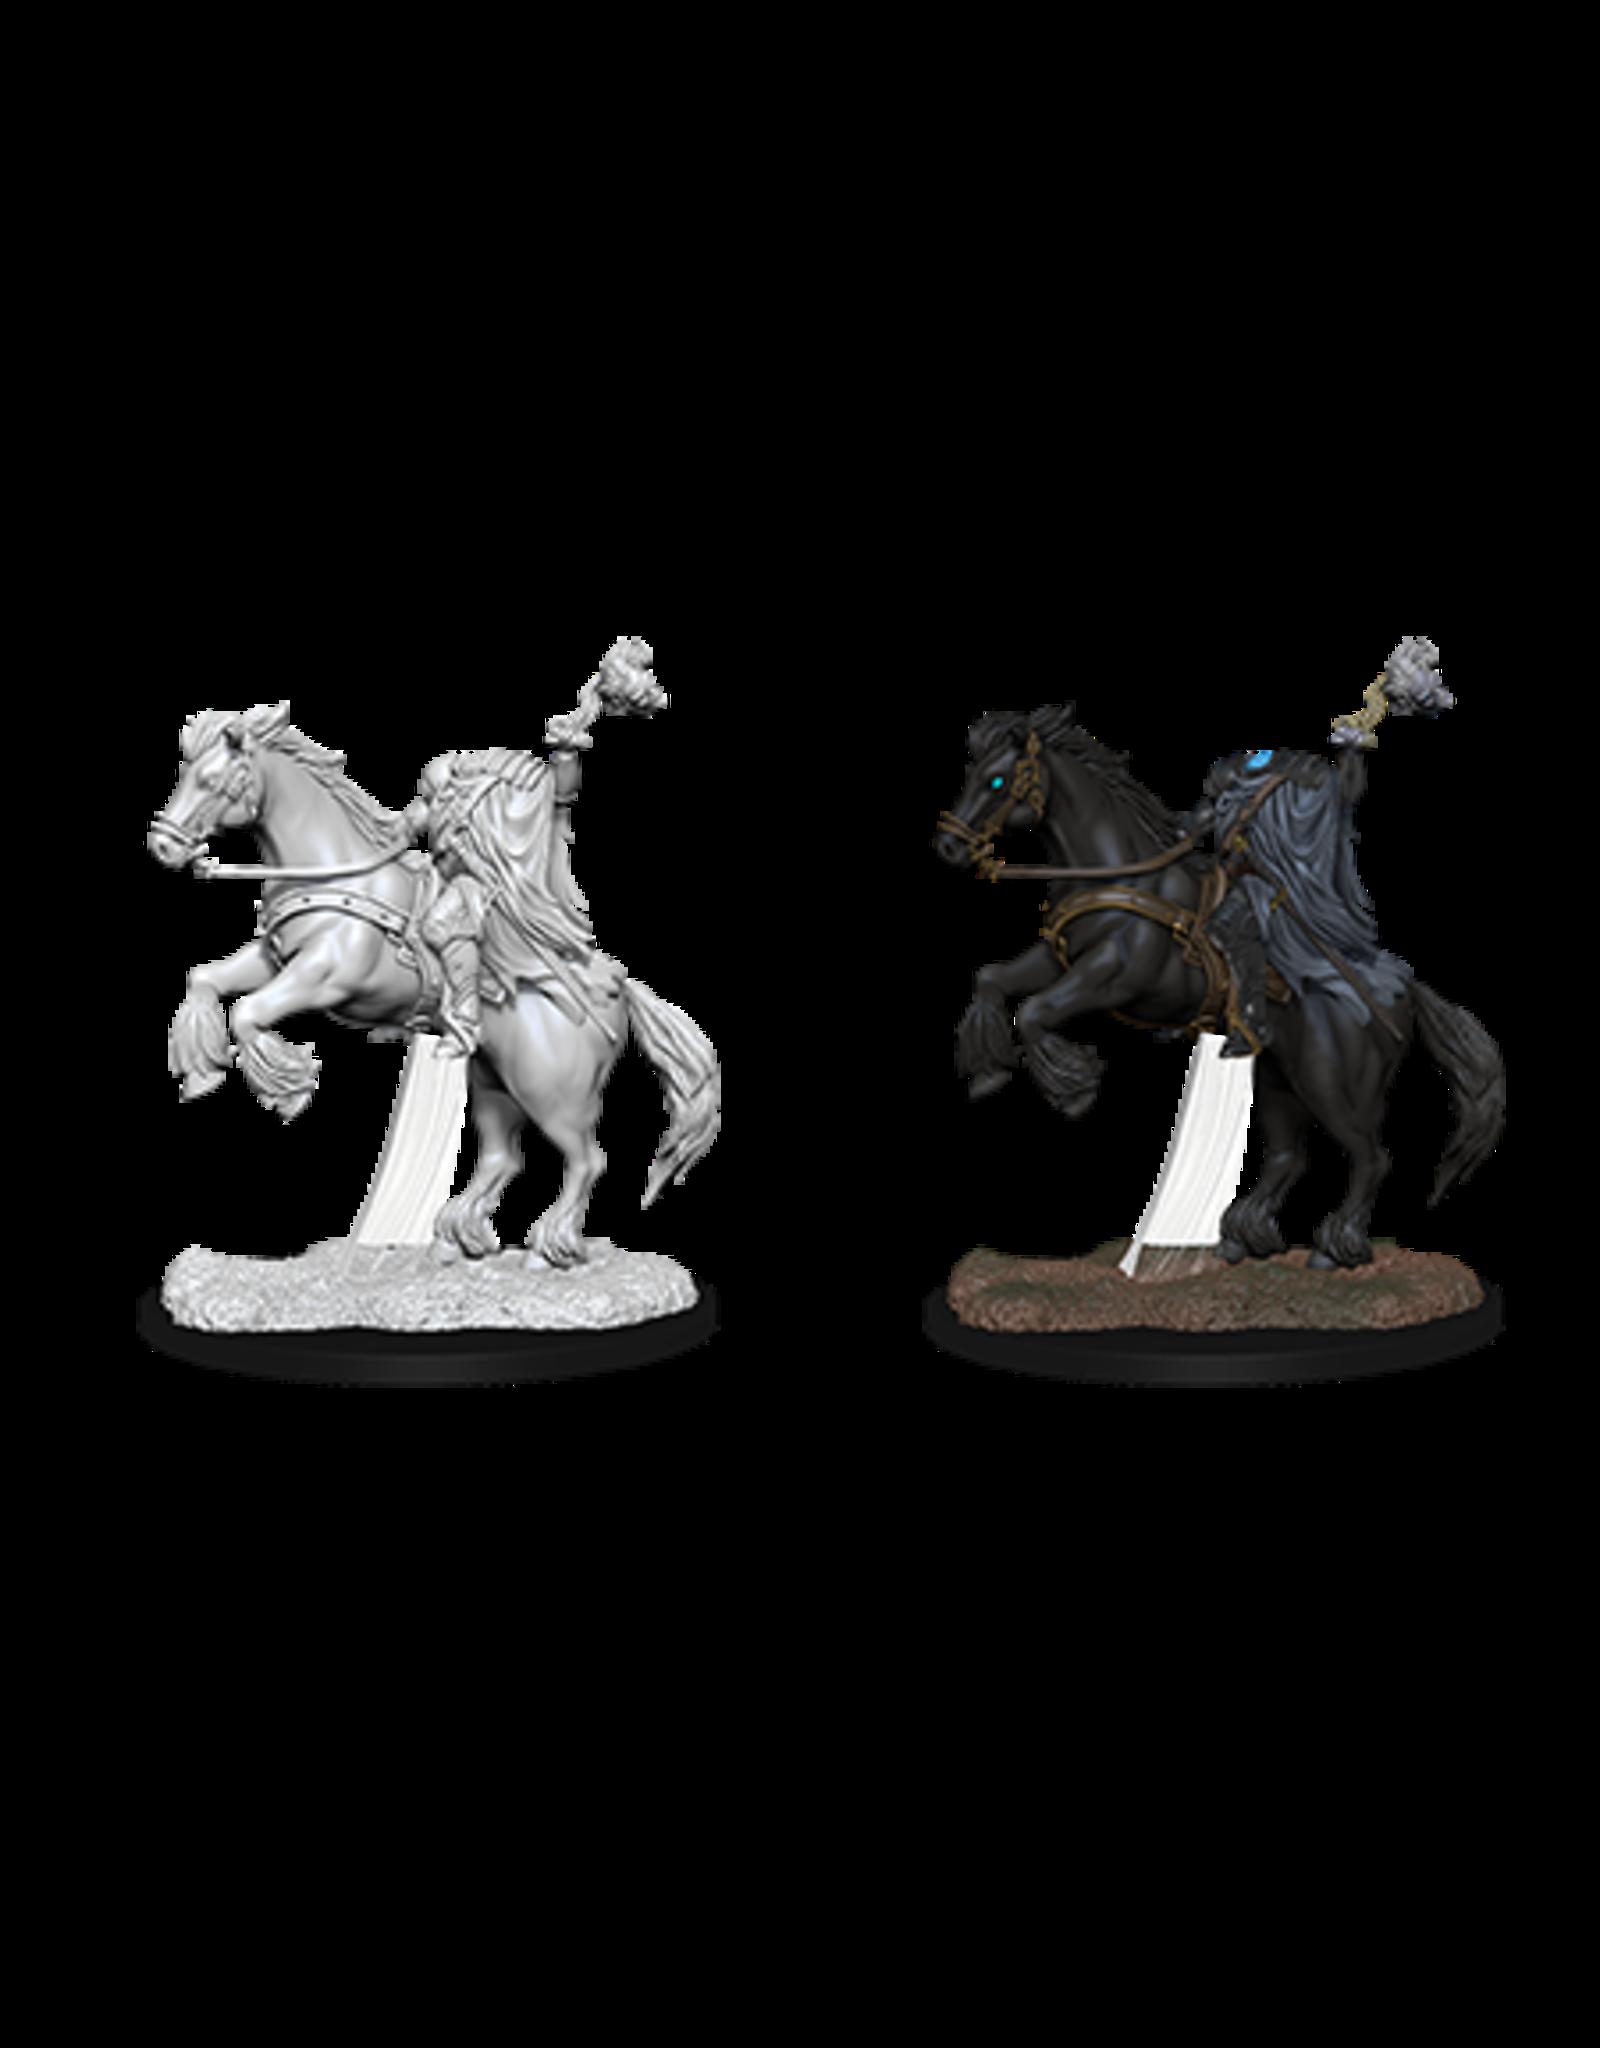 WizKids Pathfinder Minis (unpainted): Dullahan (Headless Horsemen) Wave 12, 90093